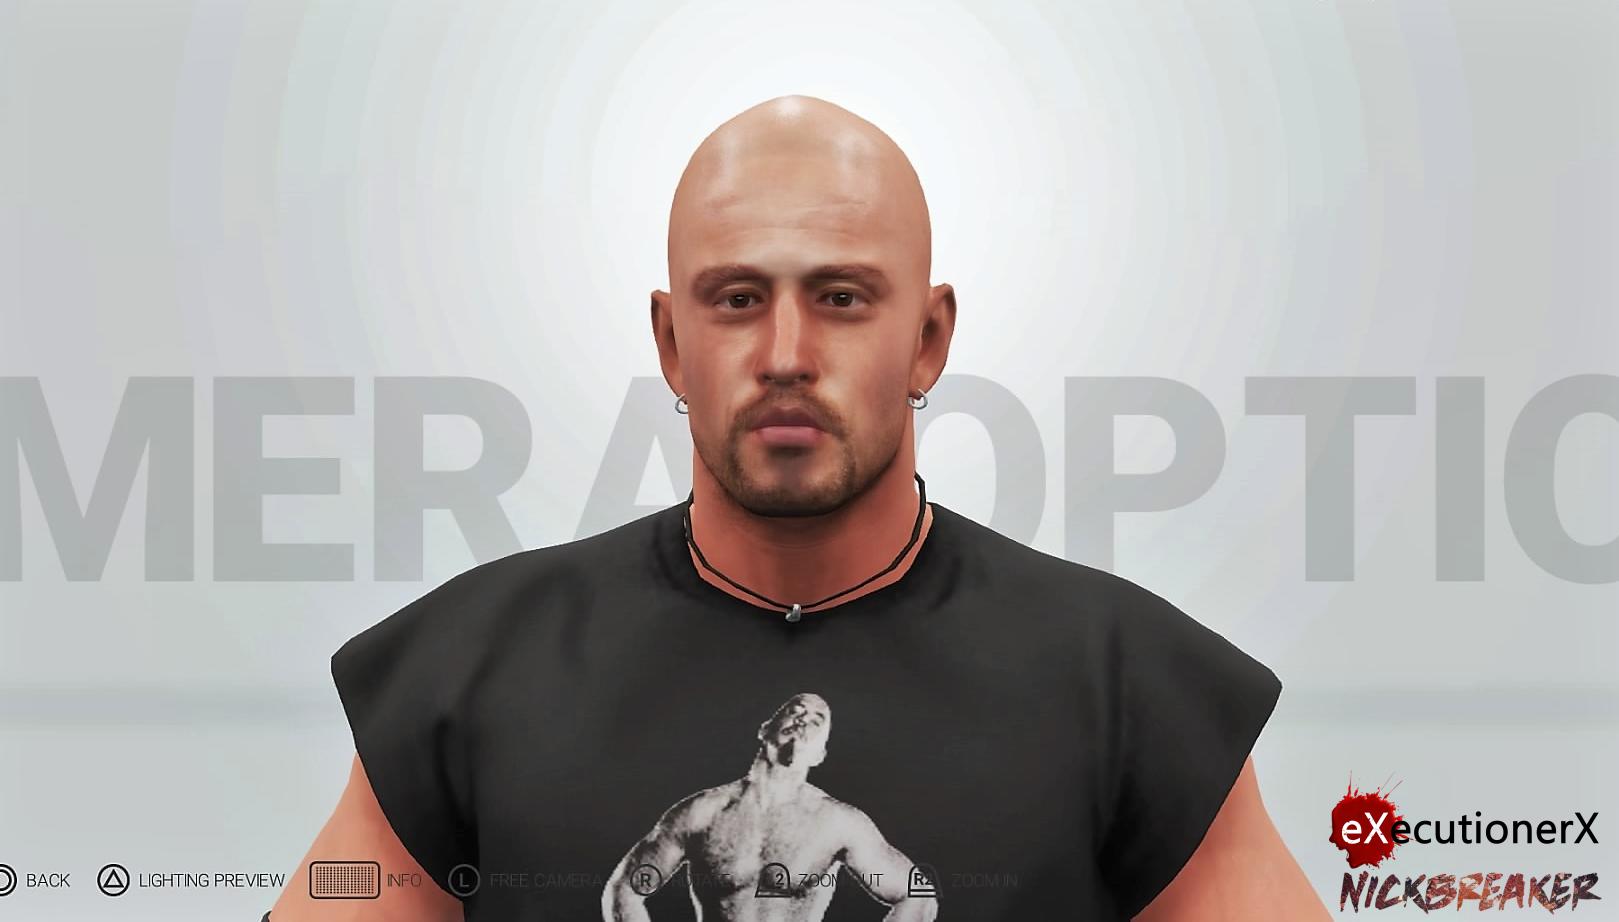 NICKBREAKER.WWE.2K18.2K19.2K20.NXT.ROH.I